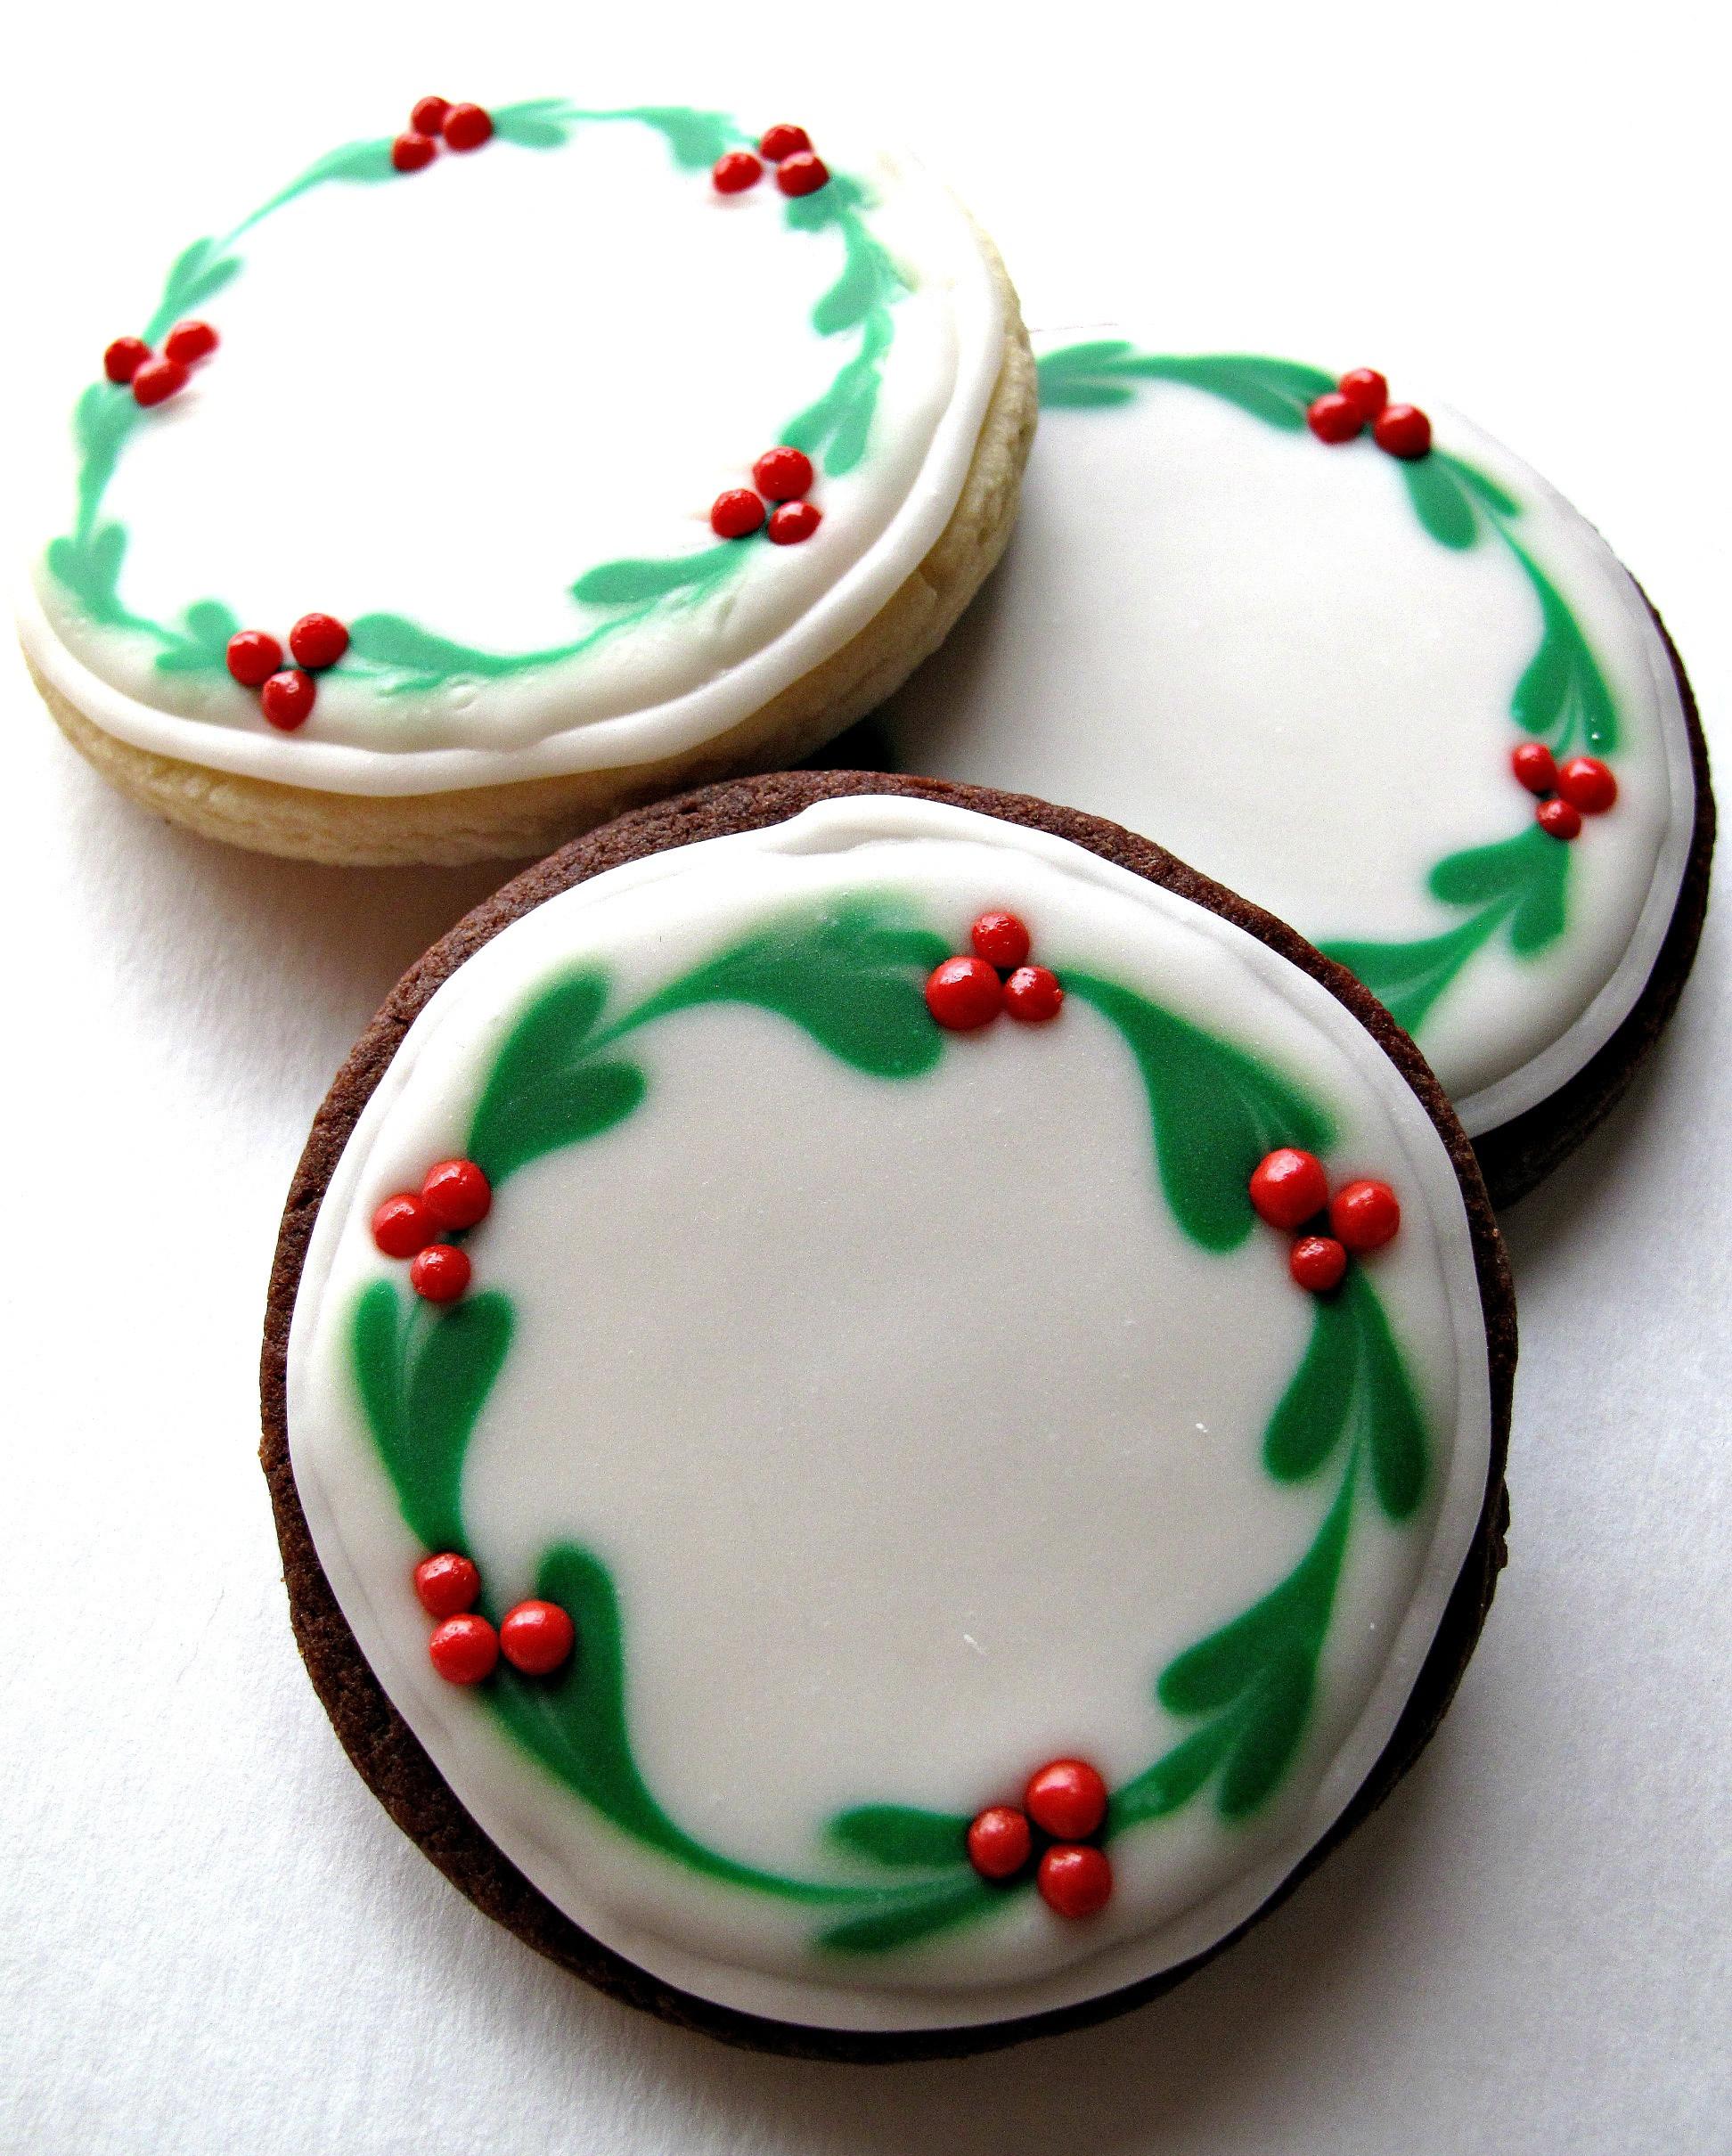 Sugar Cookies Christmas  Chocolate Covered Oreos and Iced Christmas Sugar Cookies